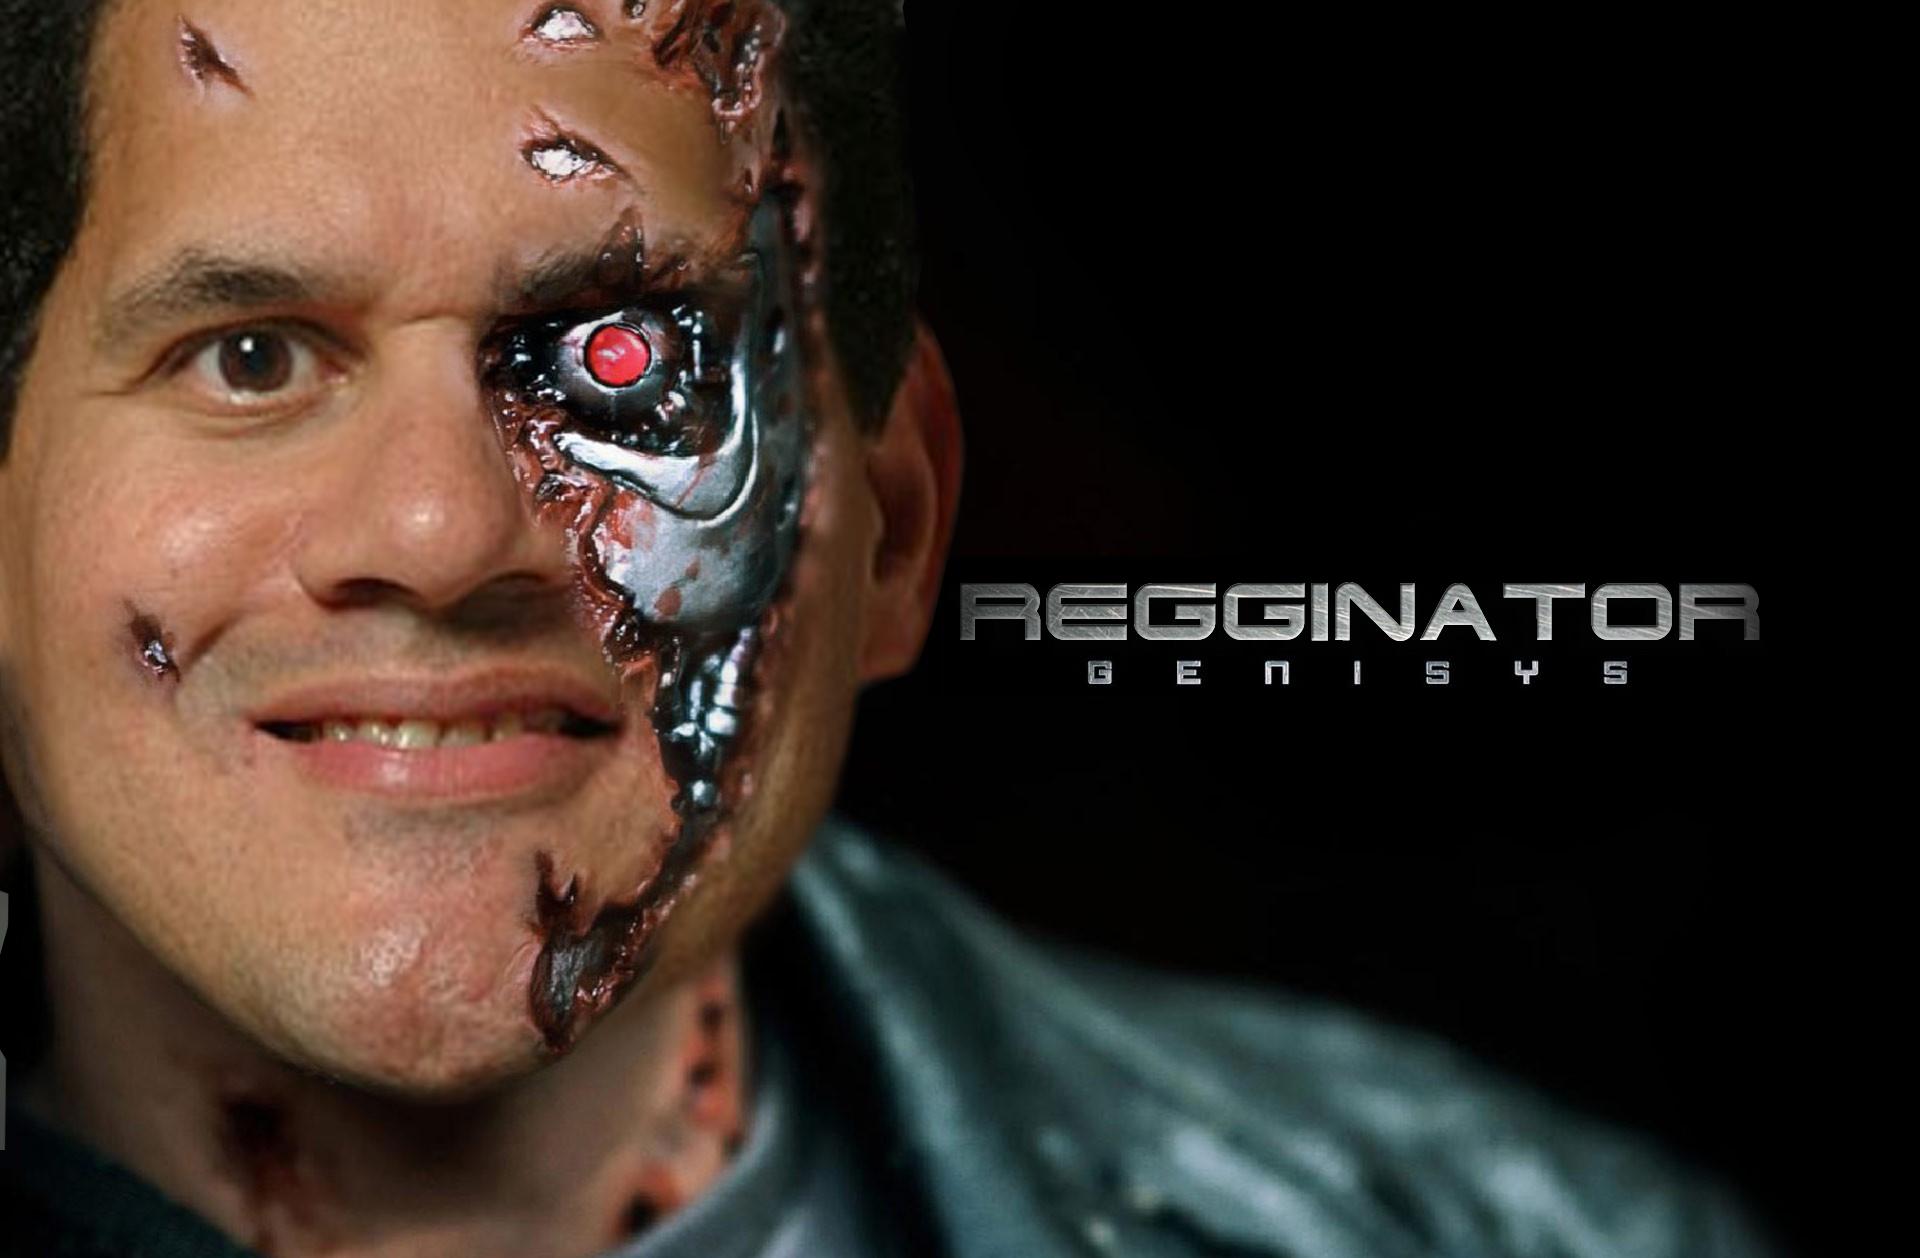 Regginator Genisys Reggie Fils Aime Know Your Meme